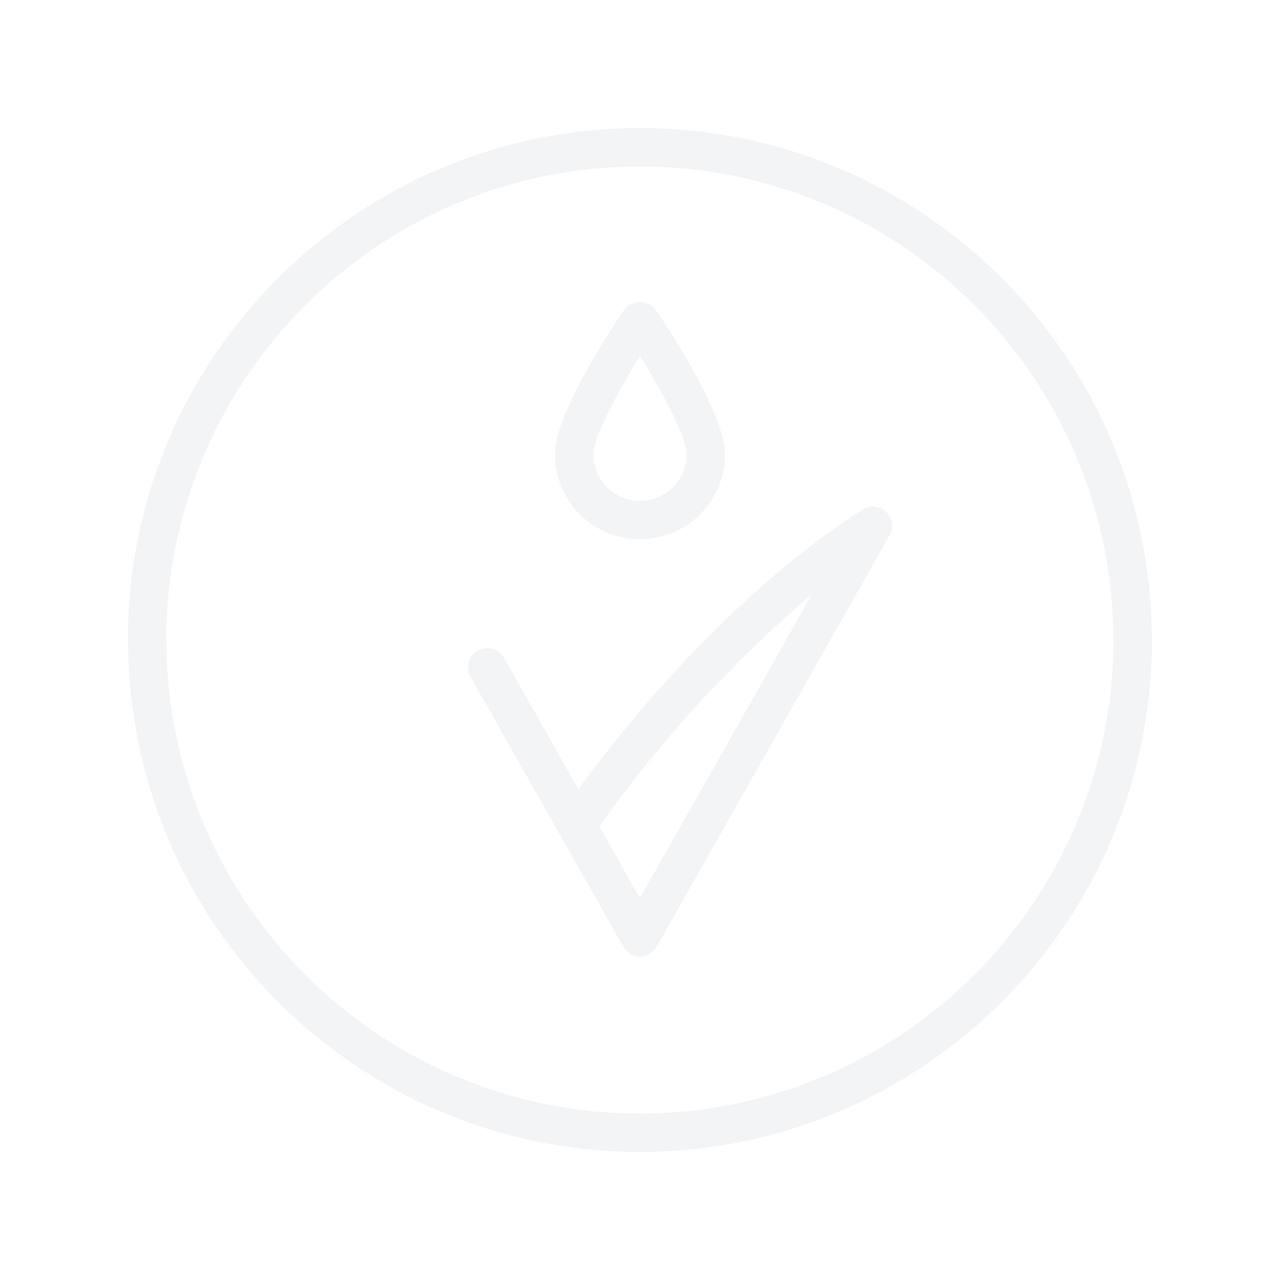 MIZON Joyful Time Essence Green Tea Mask 23g тканевая маска для лица